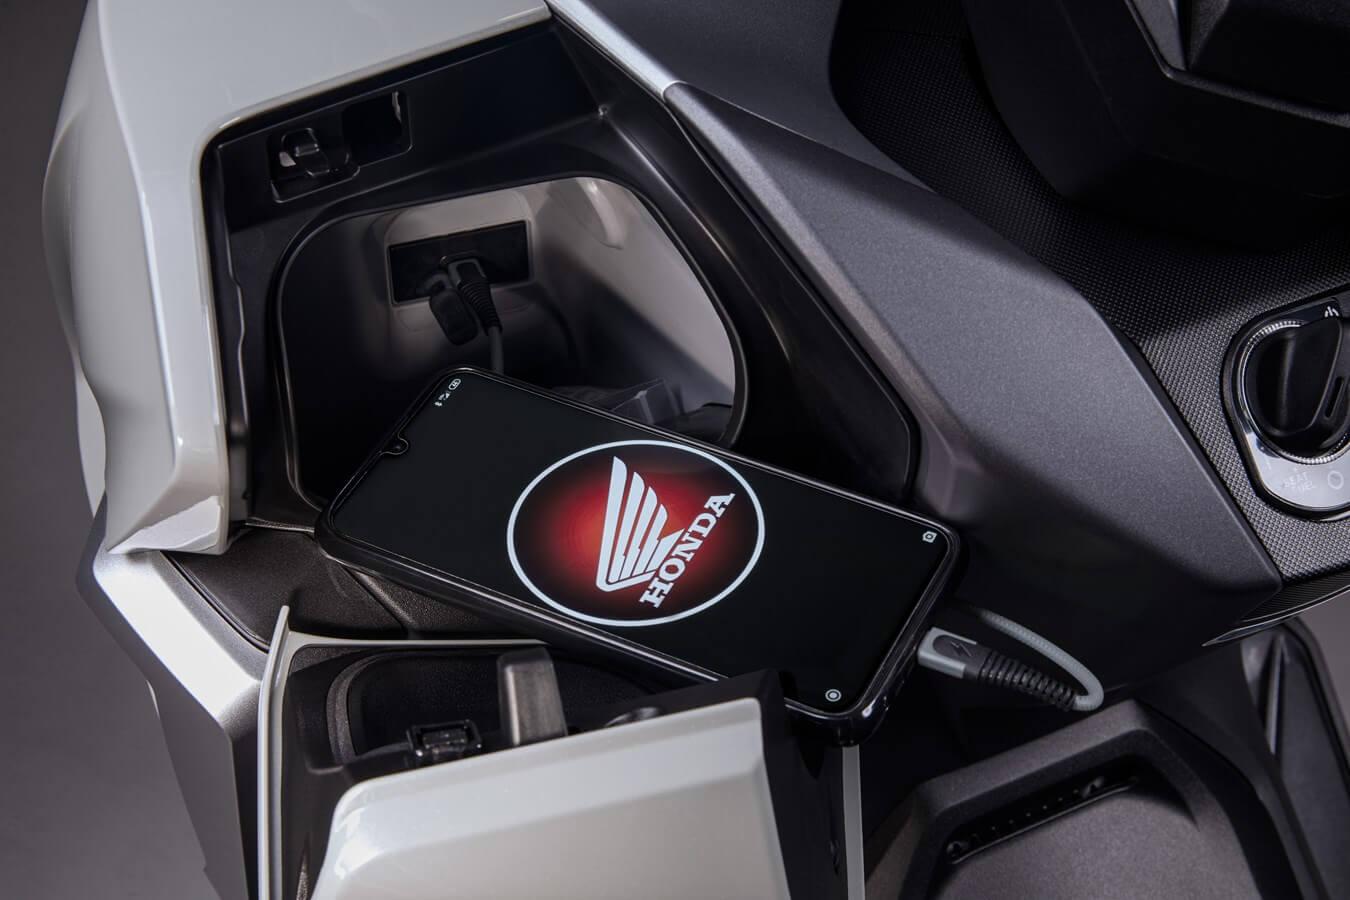 2021 Honda Forza 350 Scooter USB Plug / Phone Charger